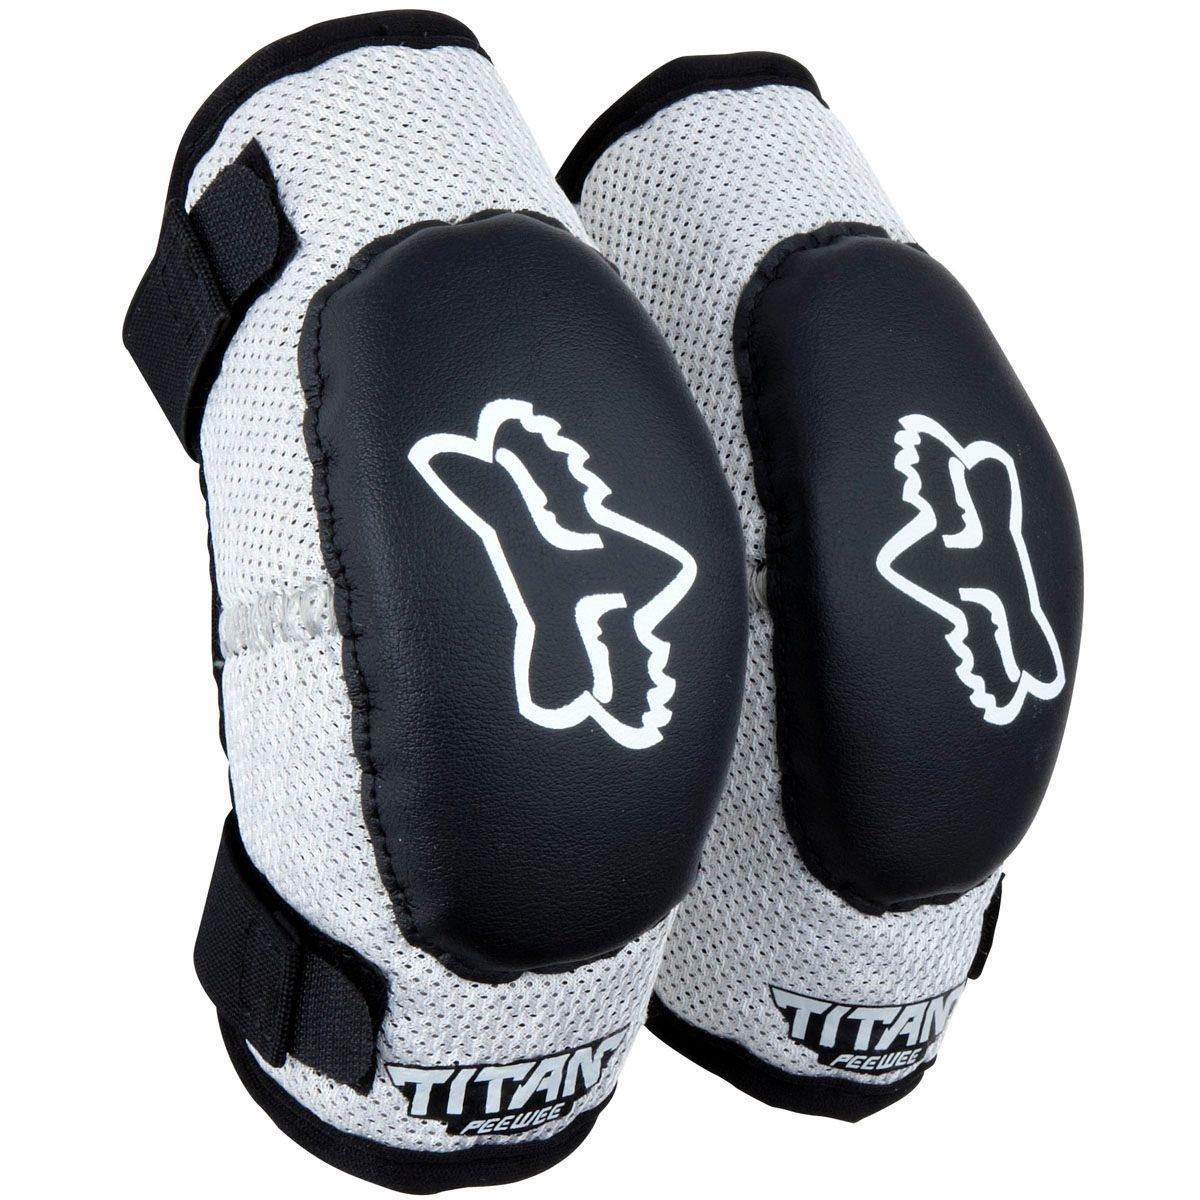 Black//Silver//PeeWee Fox Racing PeeWee Titan Adult Elbow Guard MotoX Motorcycle Body Armor ages 4-7